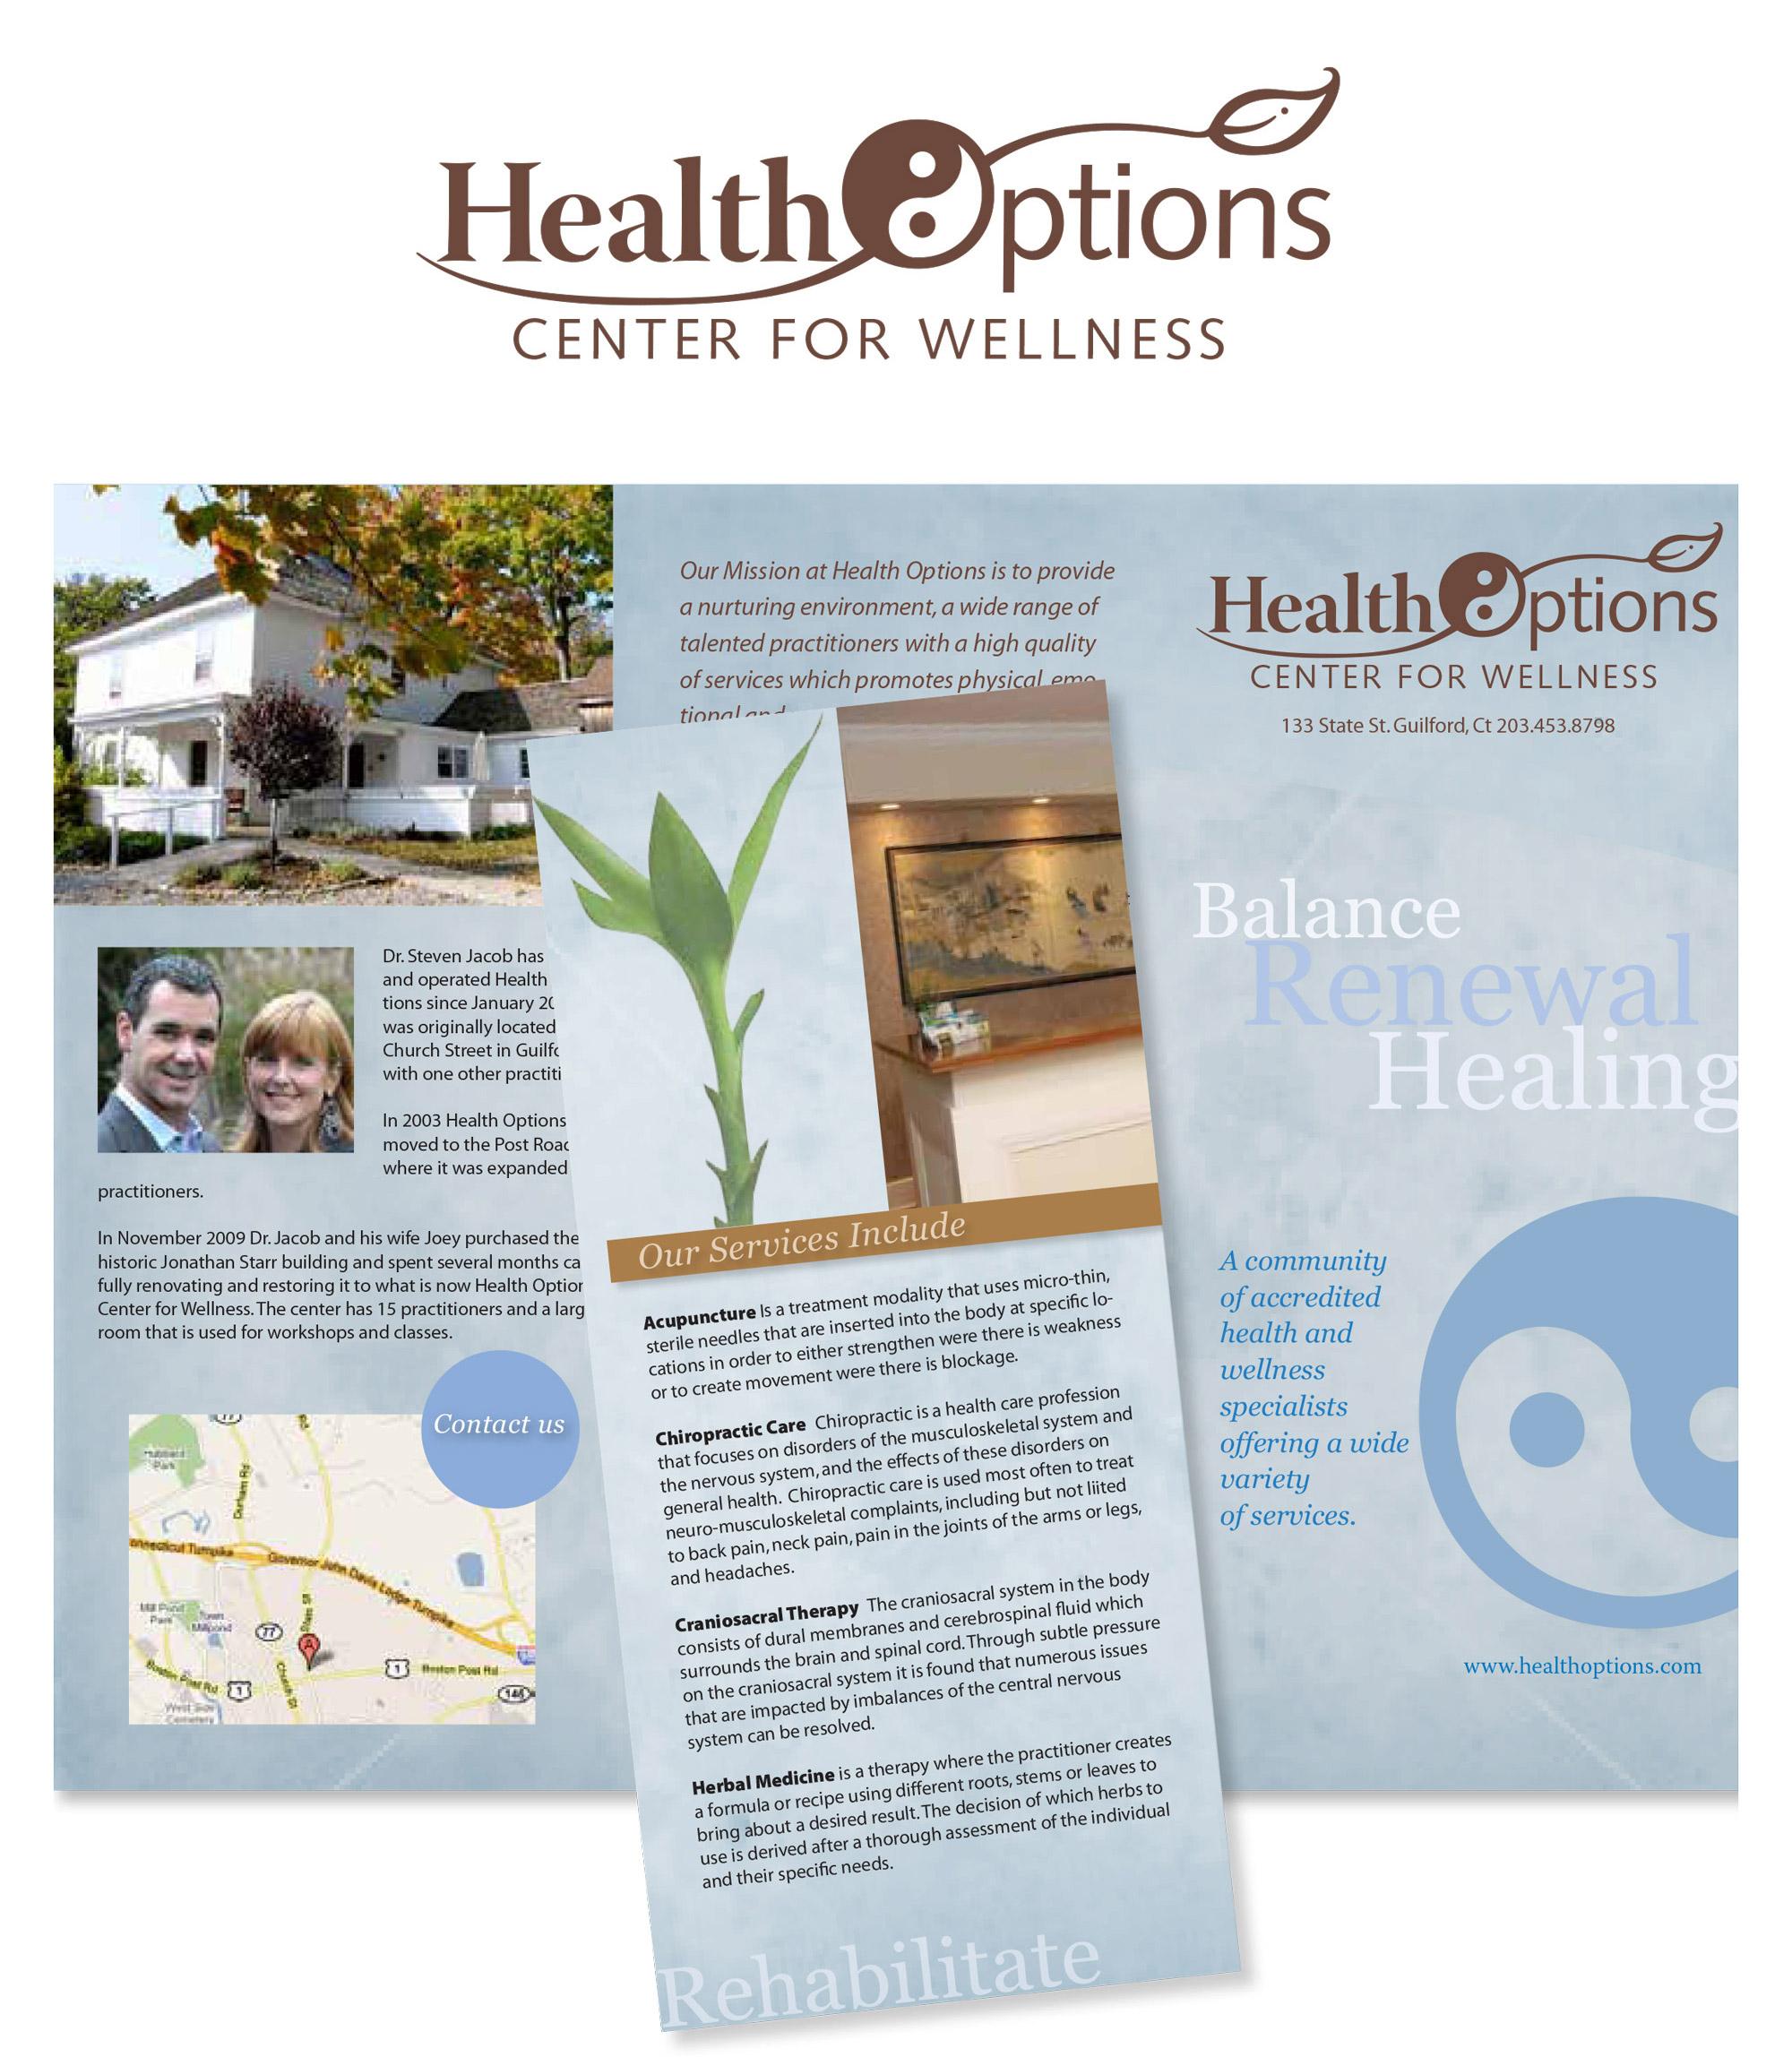 Health-Options-2-REV-1